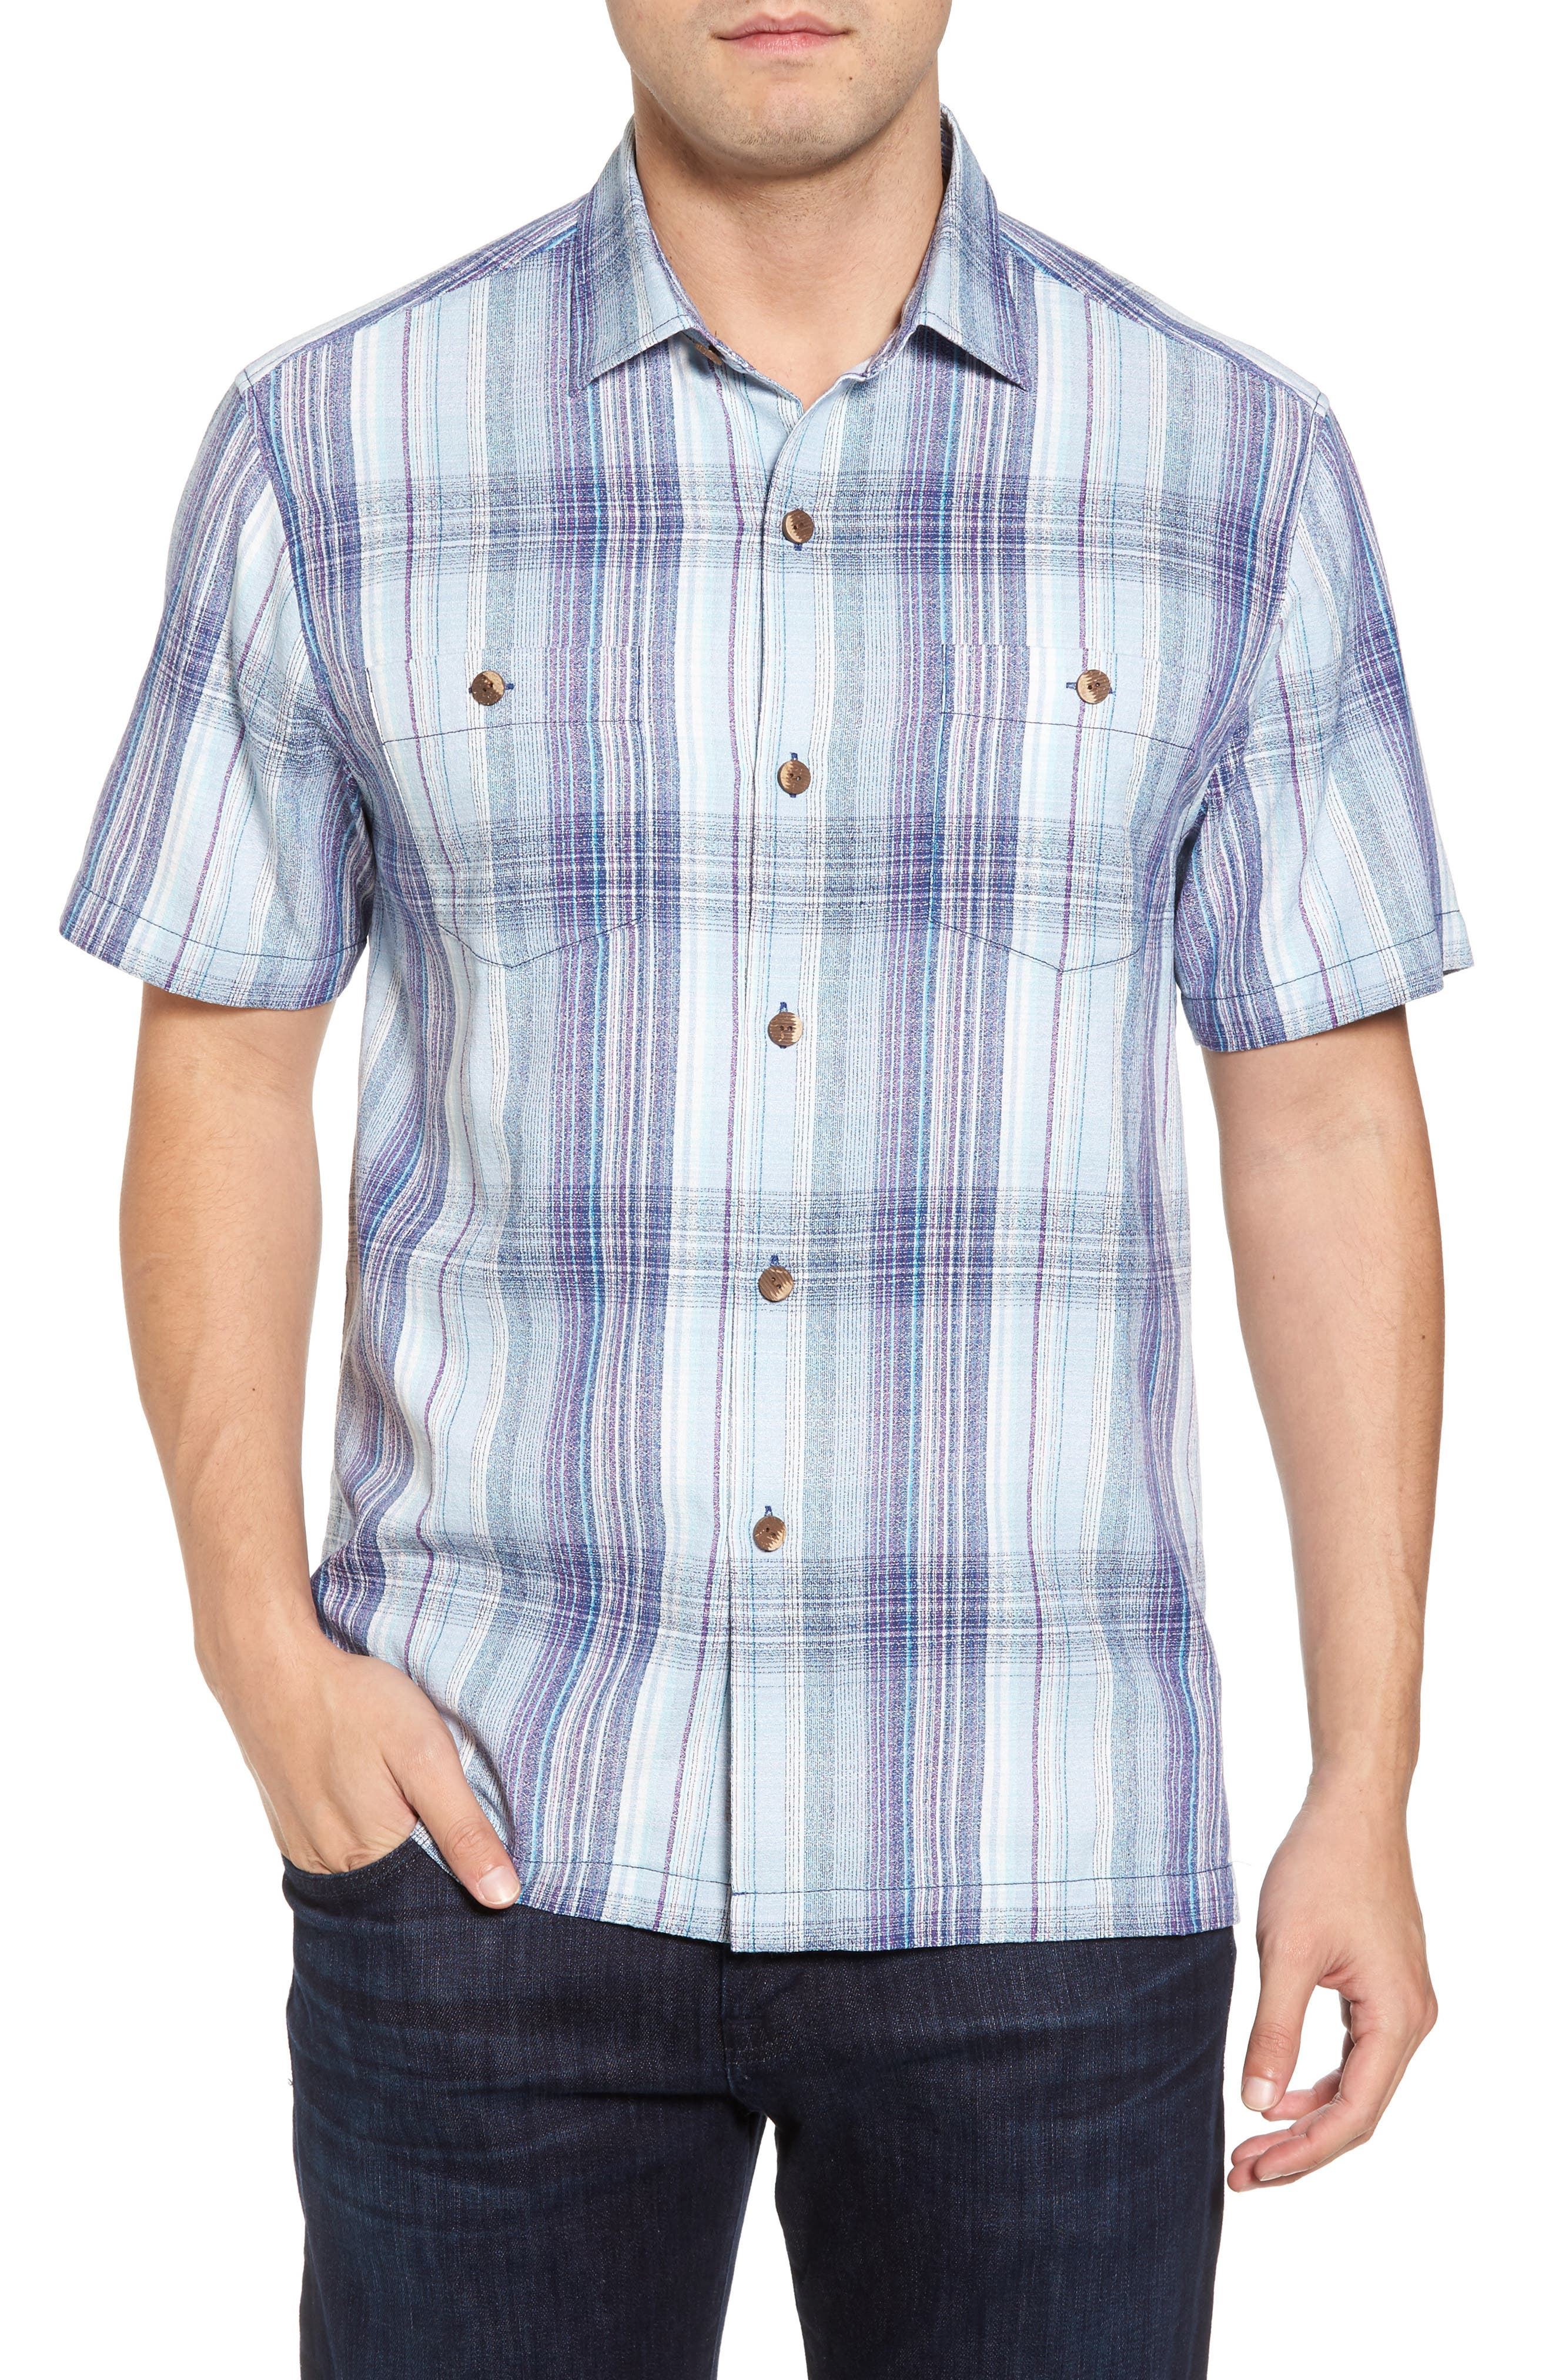 Banyan Cay Plaid Silk Blend Camp Shirt,                         Main,                         color, Dockside Blue